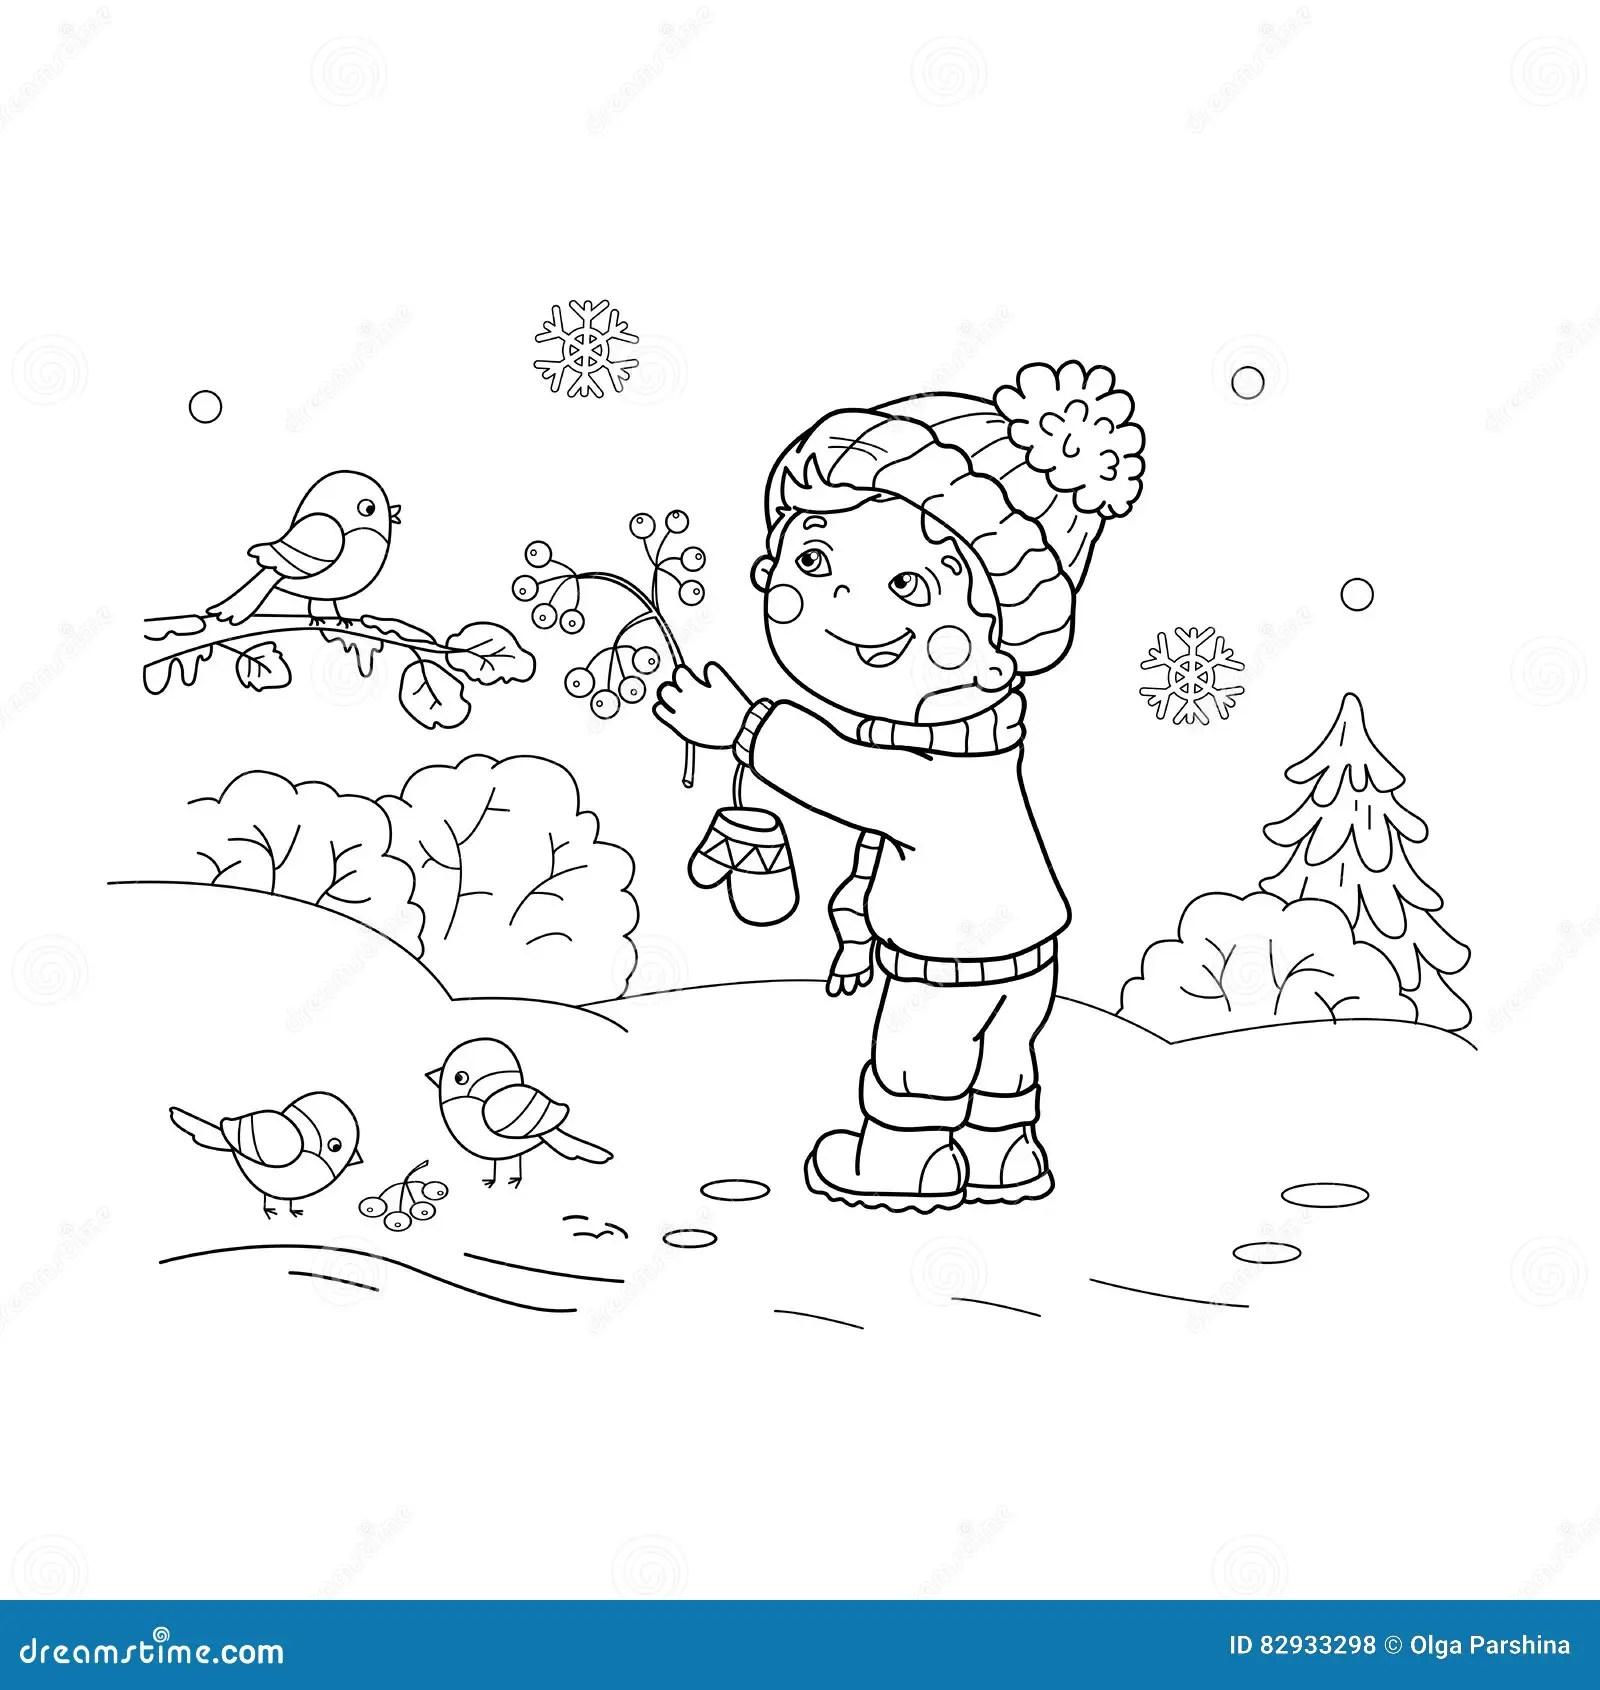 Coloring Page Outline Of Cartoon Boy Feeding Birds. Stock